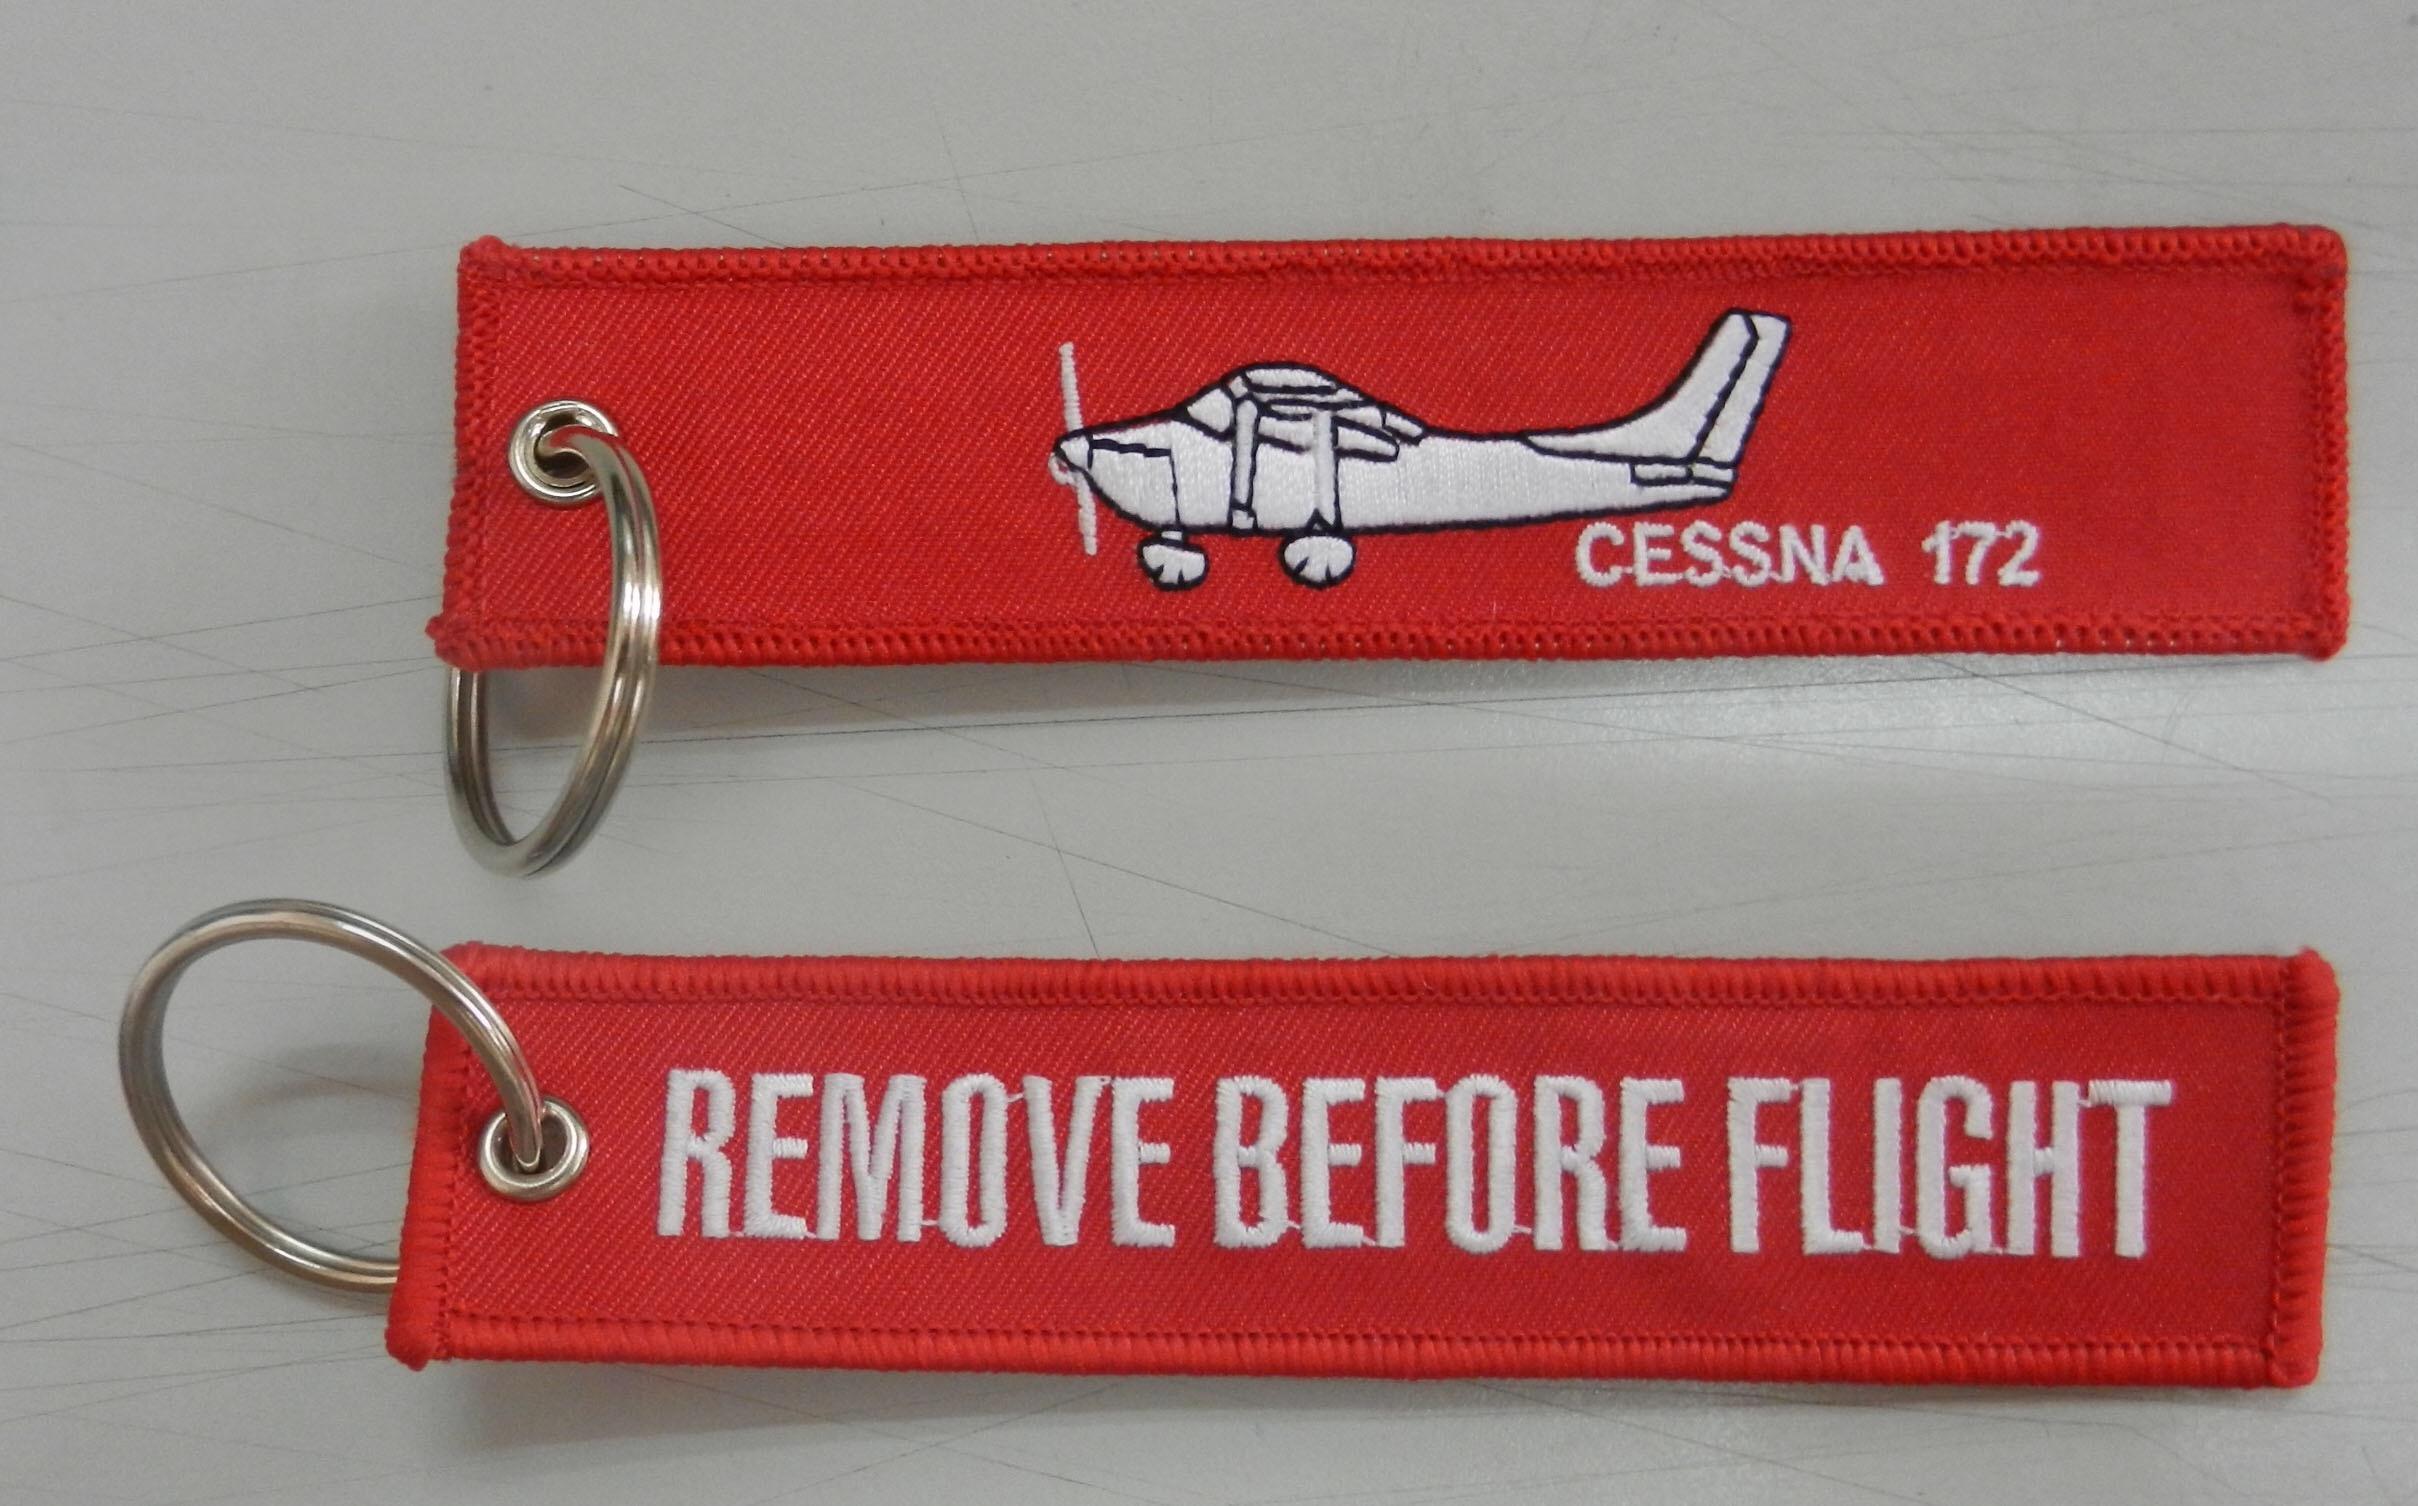 REMOVE BEFORE FLIGHT CESSNA